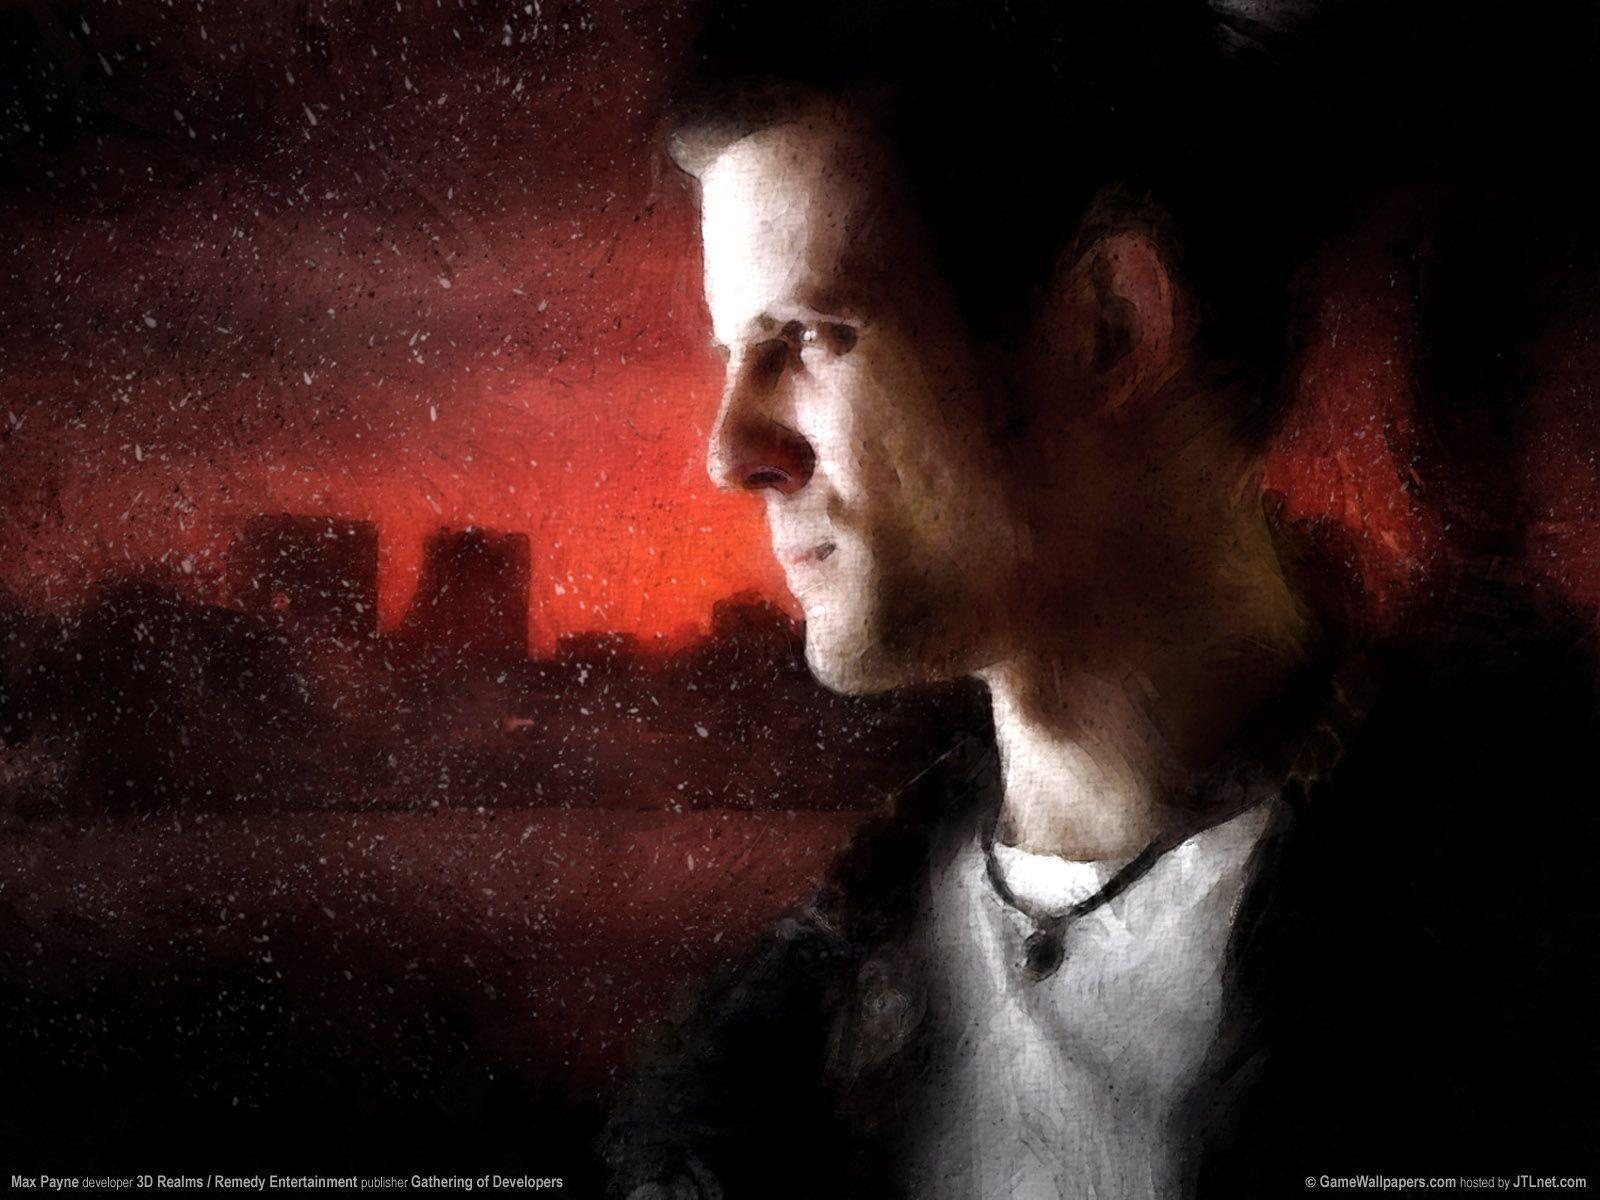 Max Payne Wallpapers Wallpaper Cave